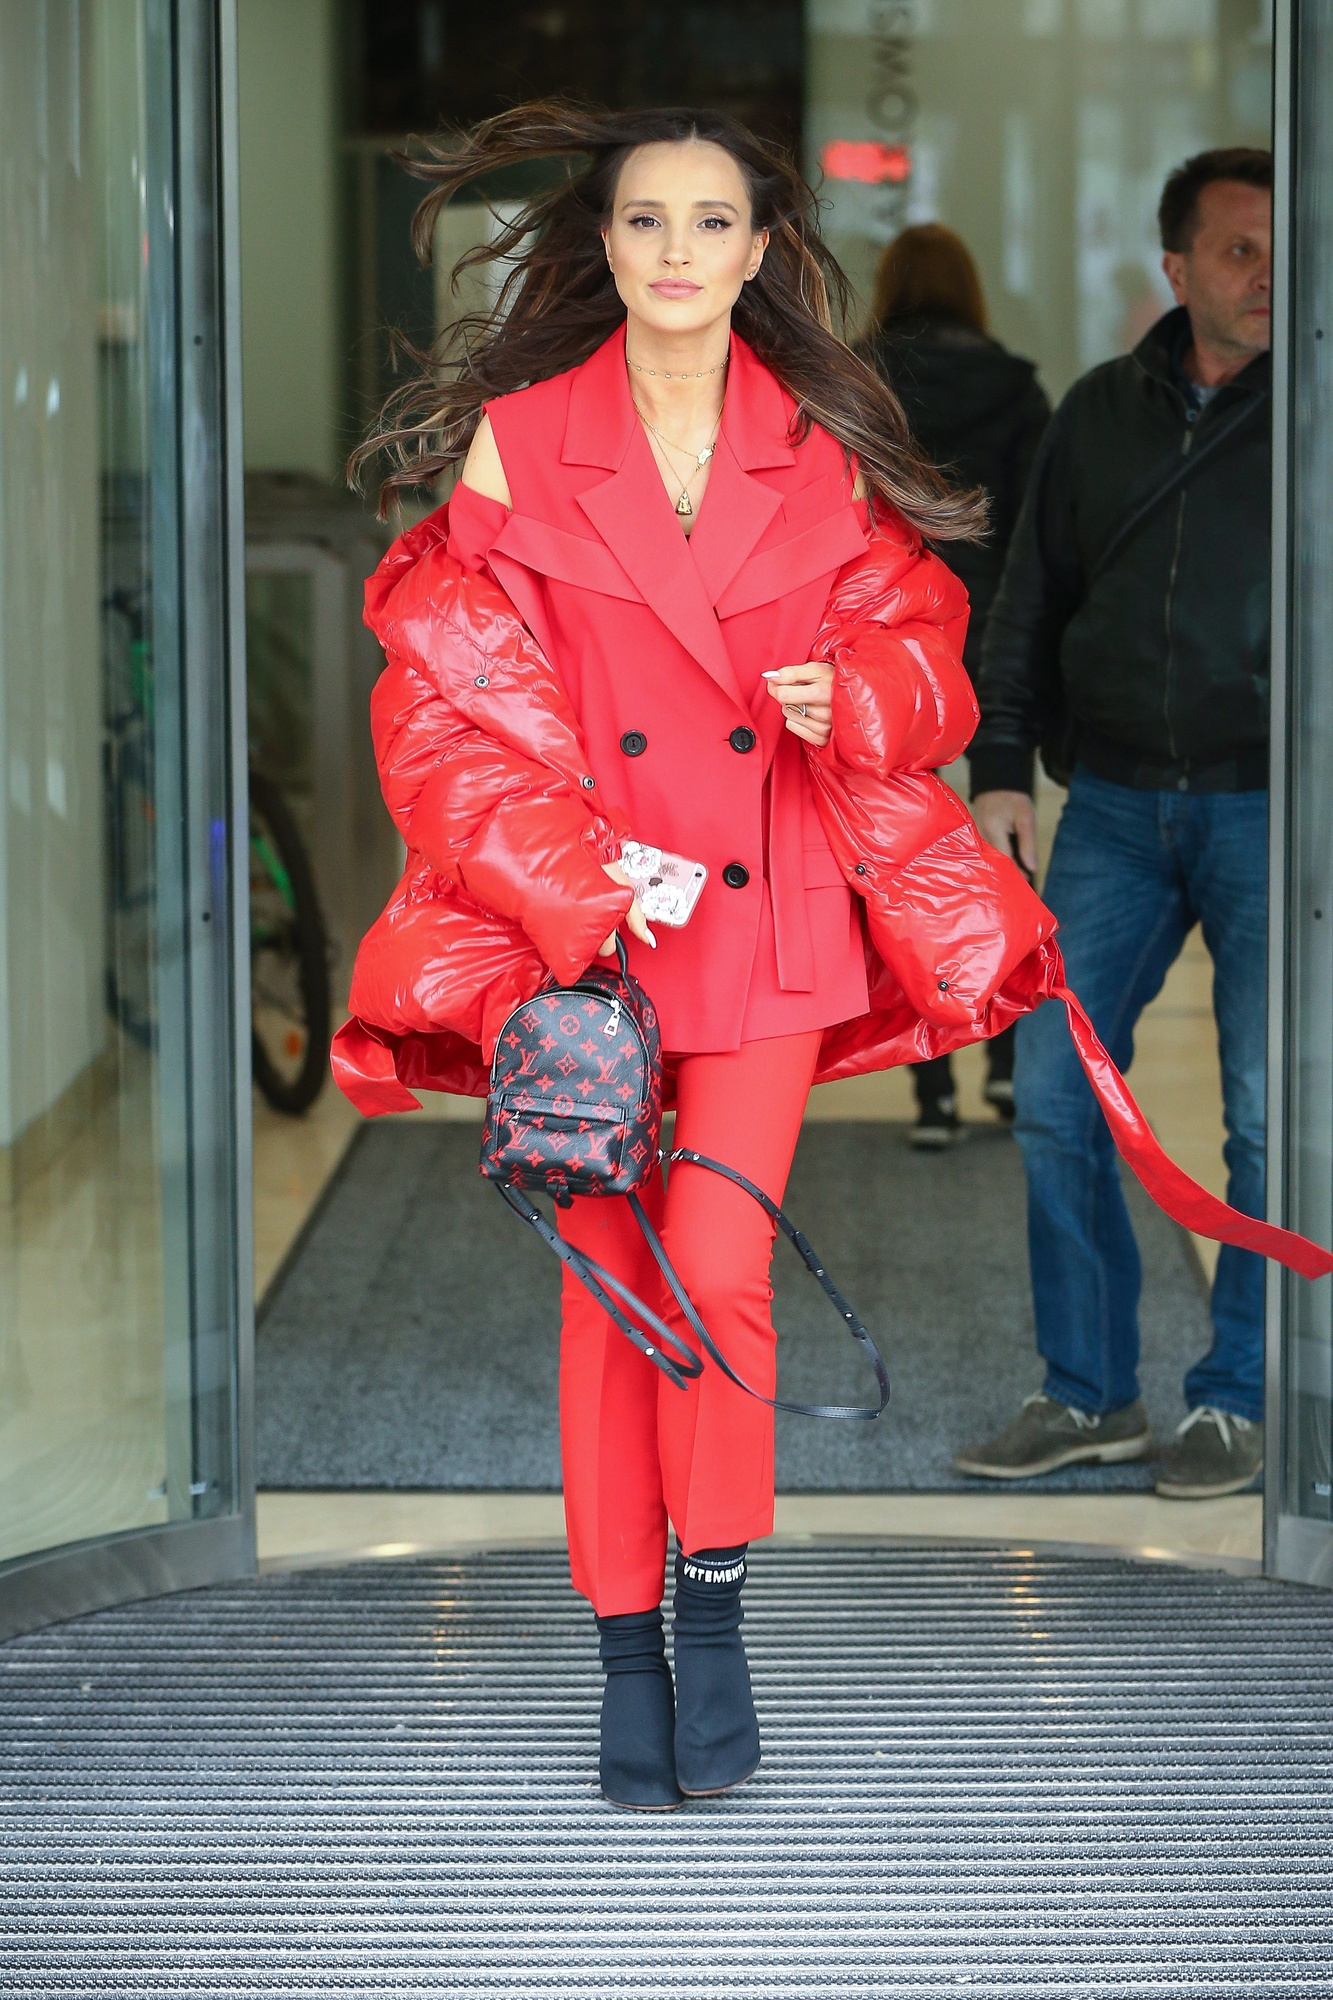 Hot or not: Marina w Vetements, MMC i z plecakiem Louis Vuitton [SONDA]